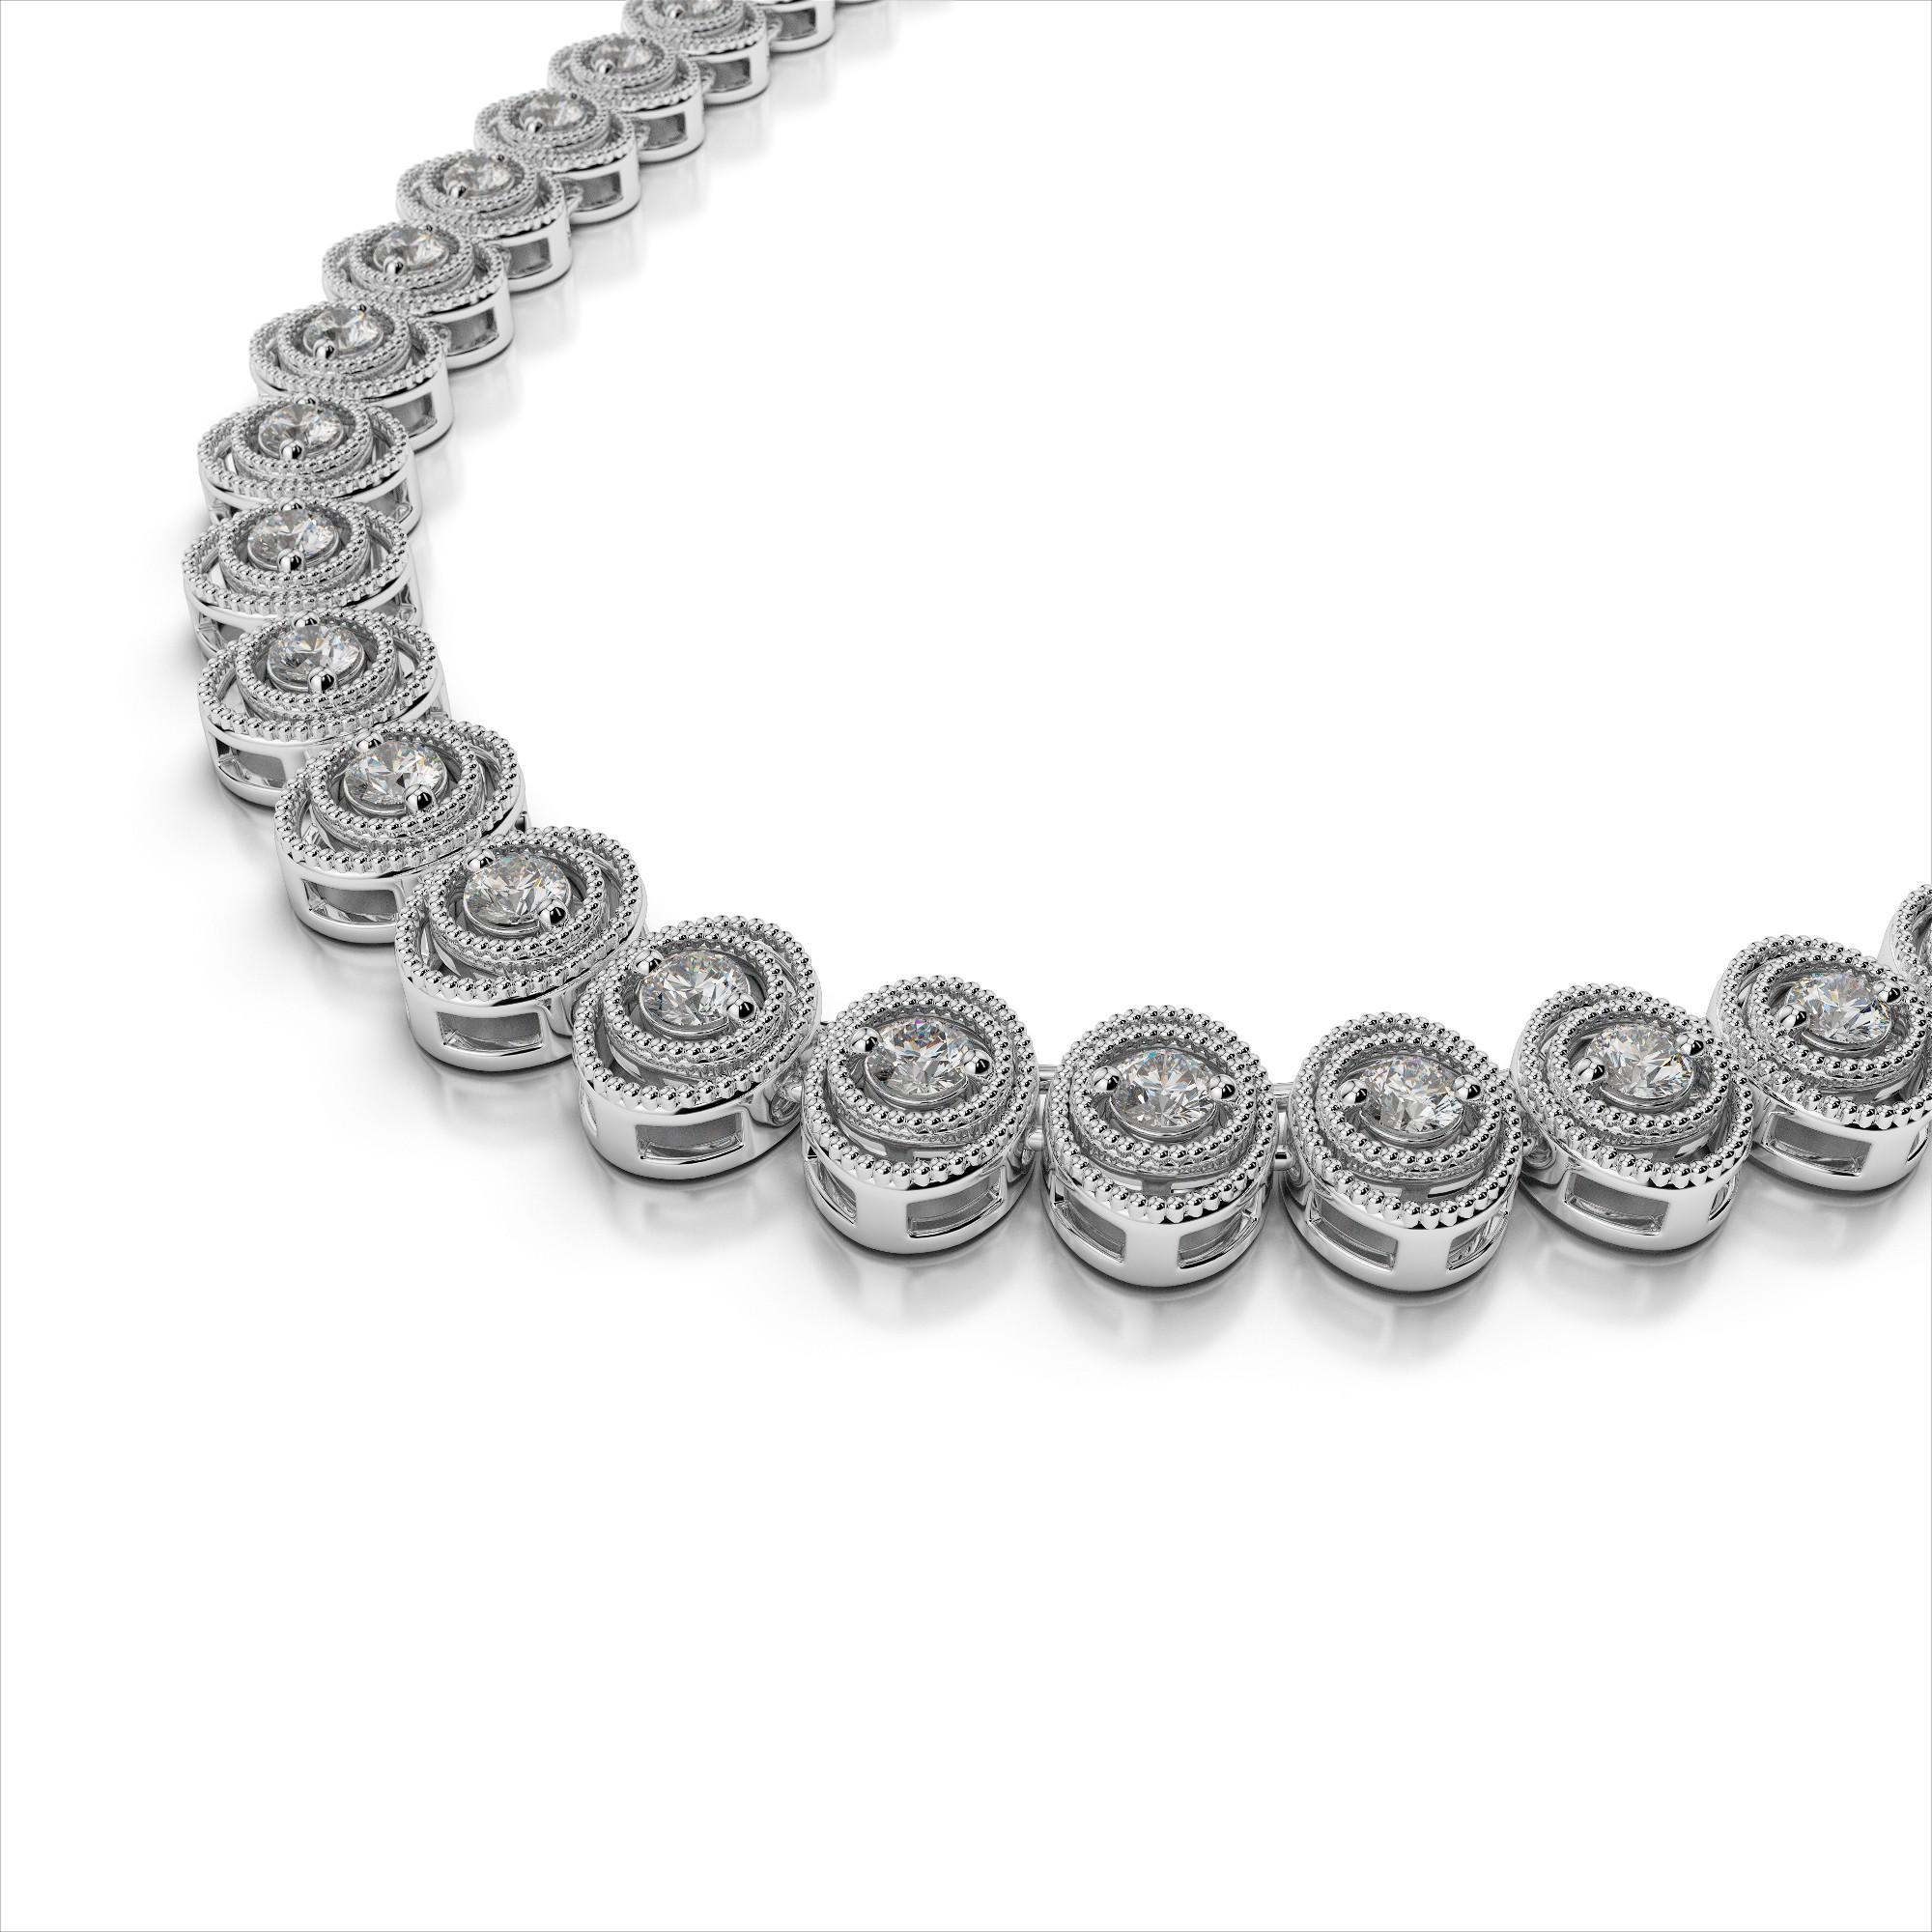 Antique Oval Diamond Necklace